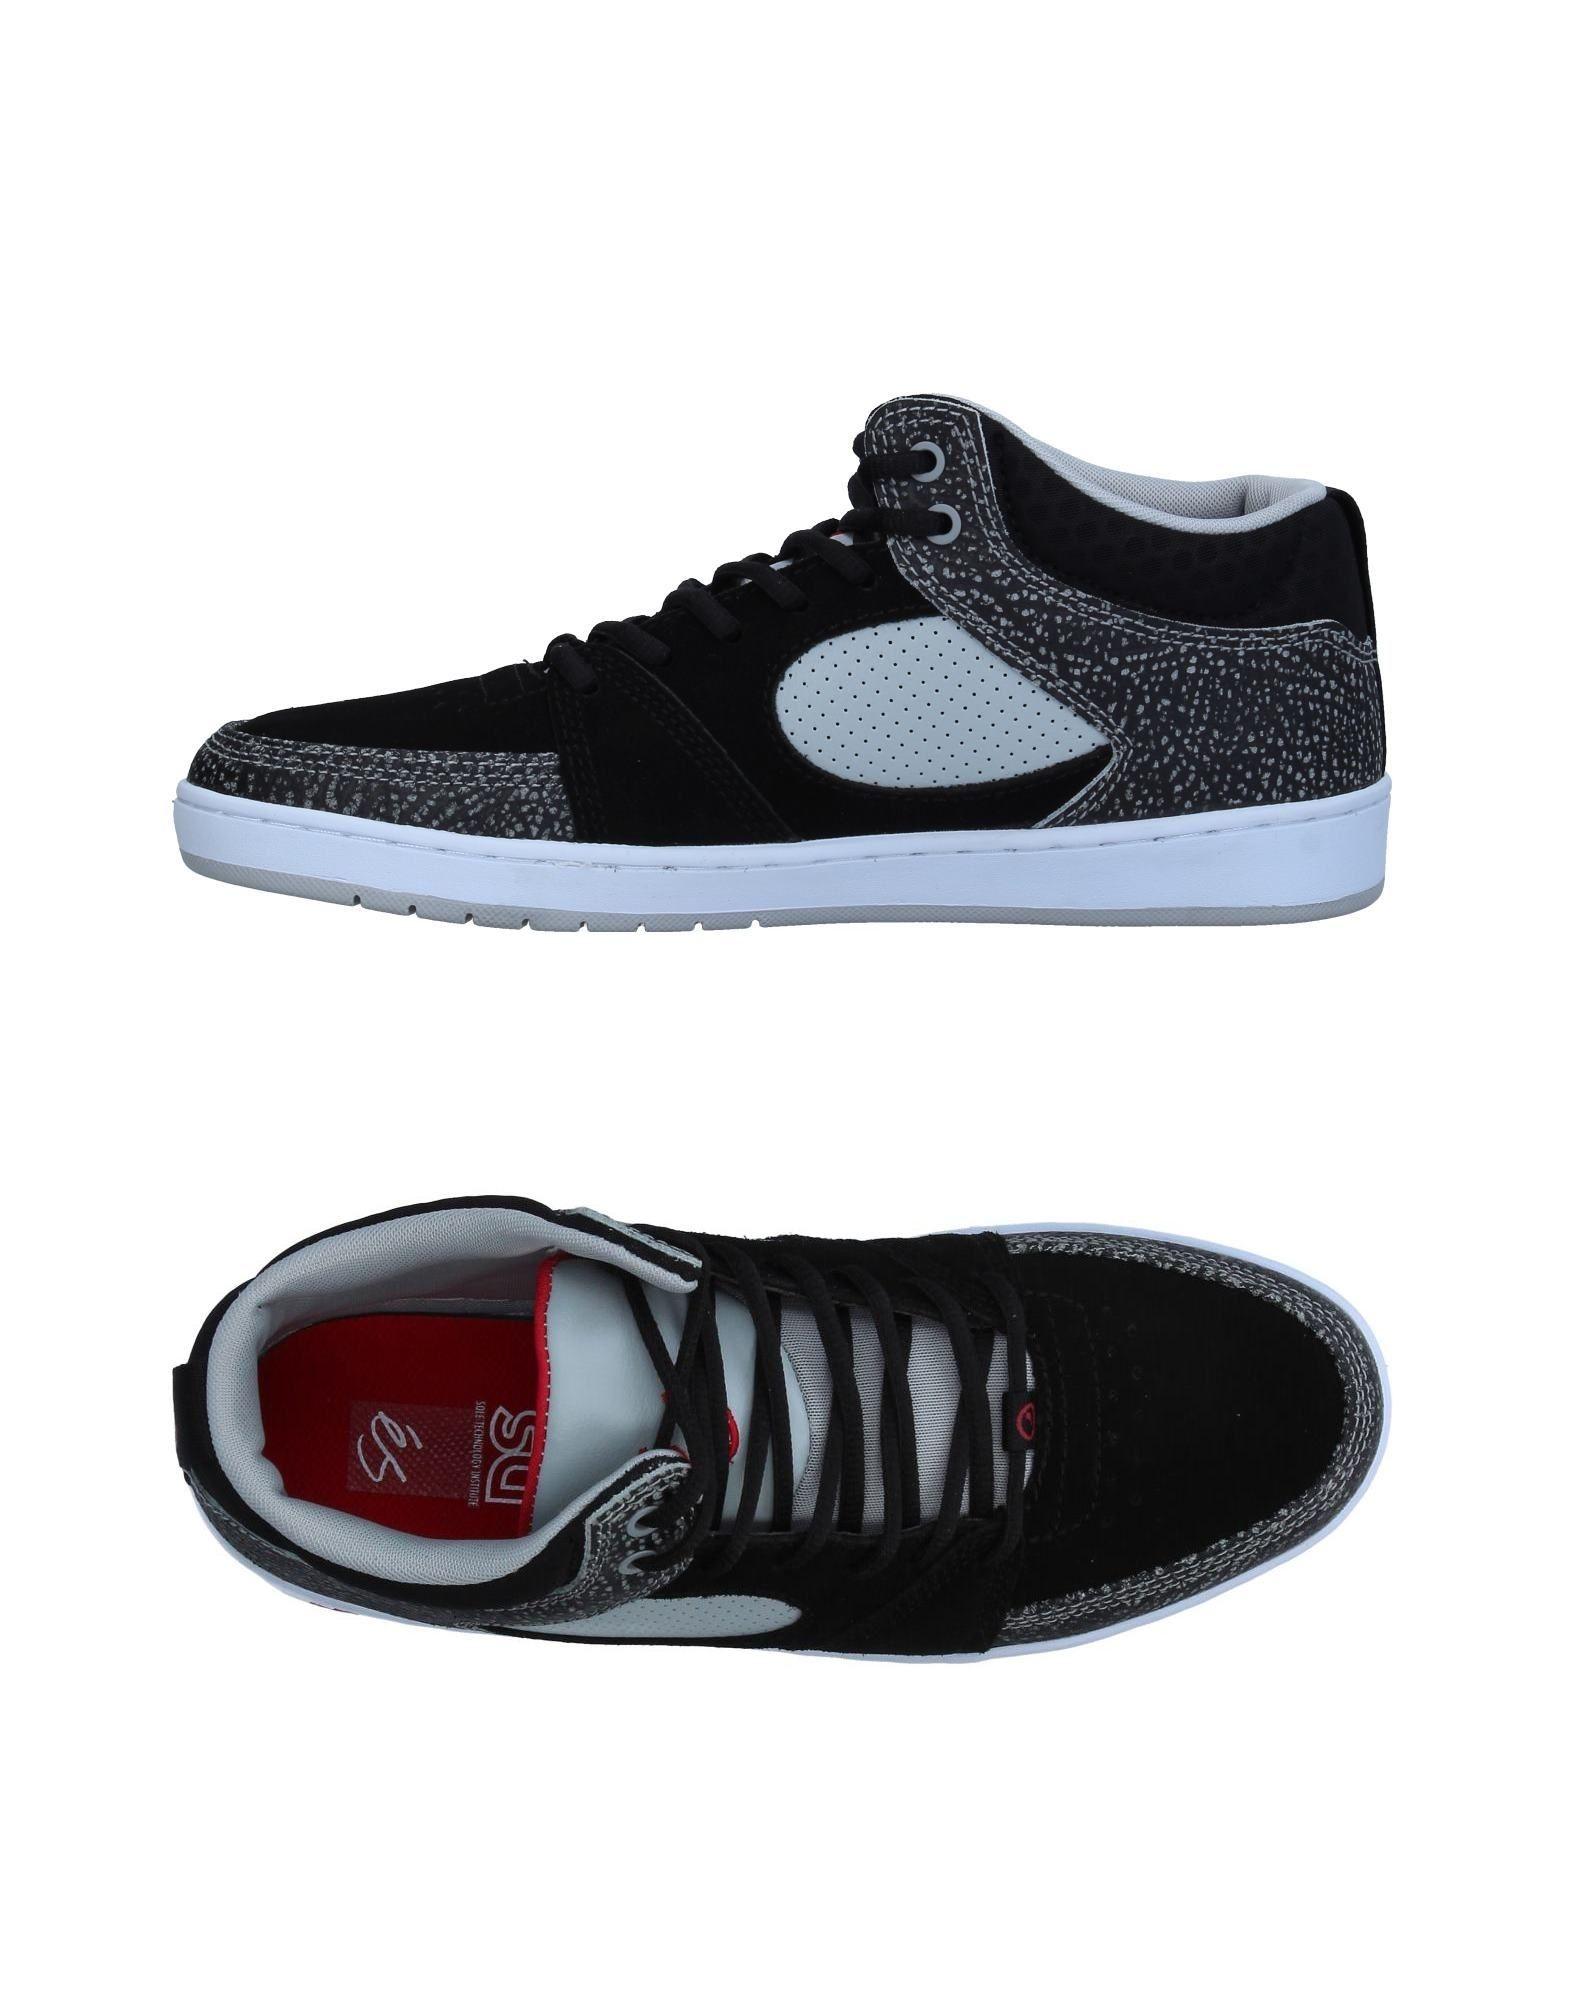 Sneakers És Homme - Sneakers És sur